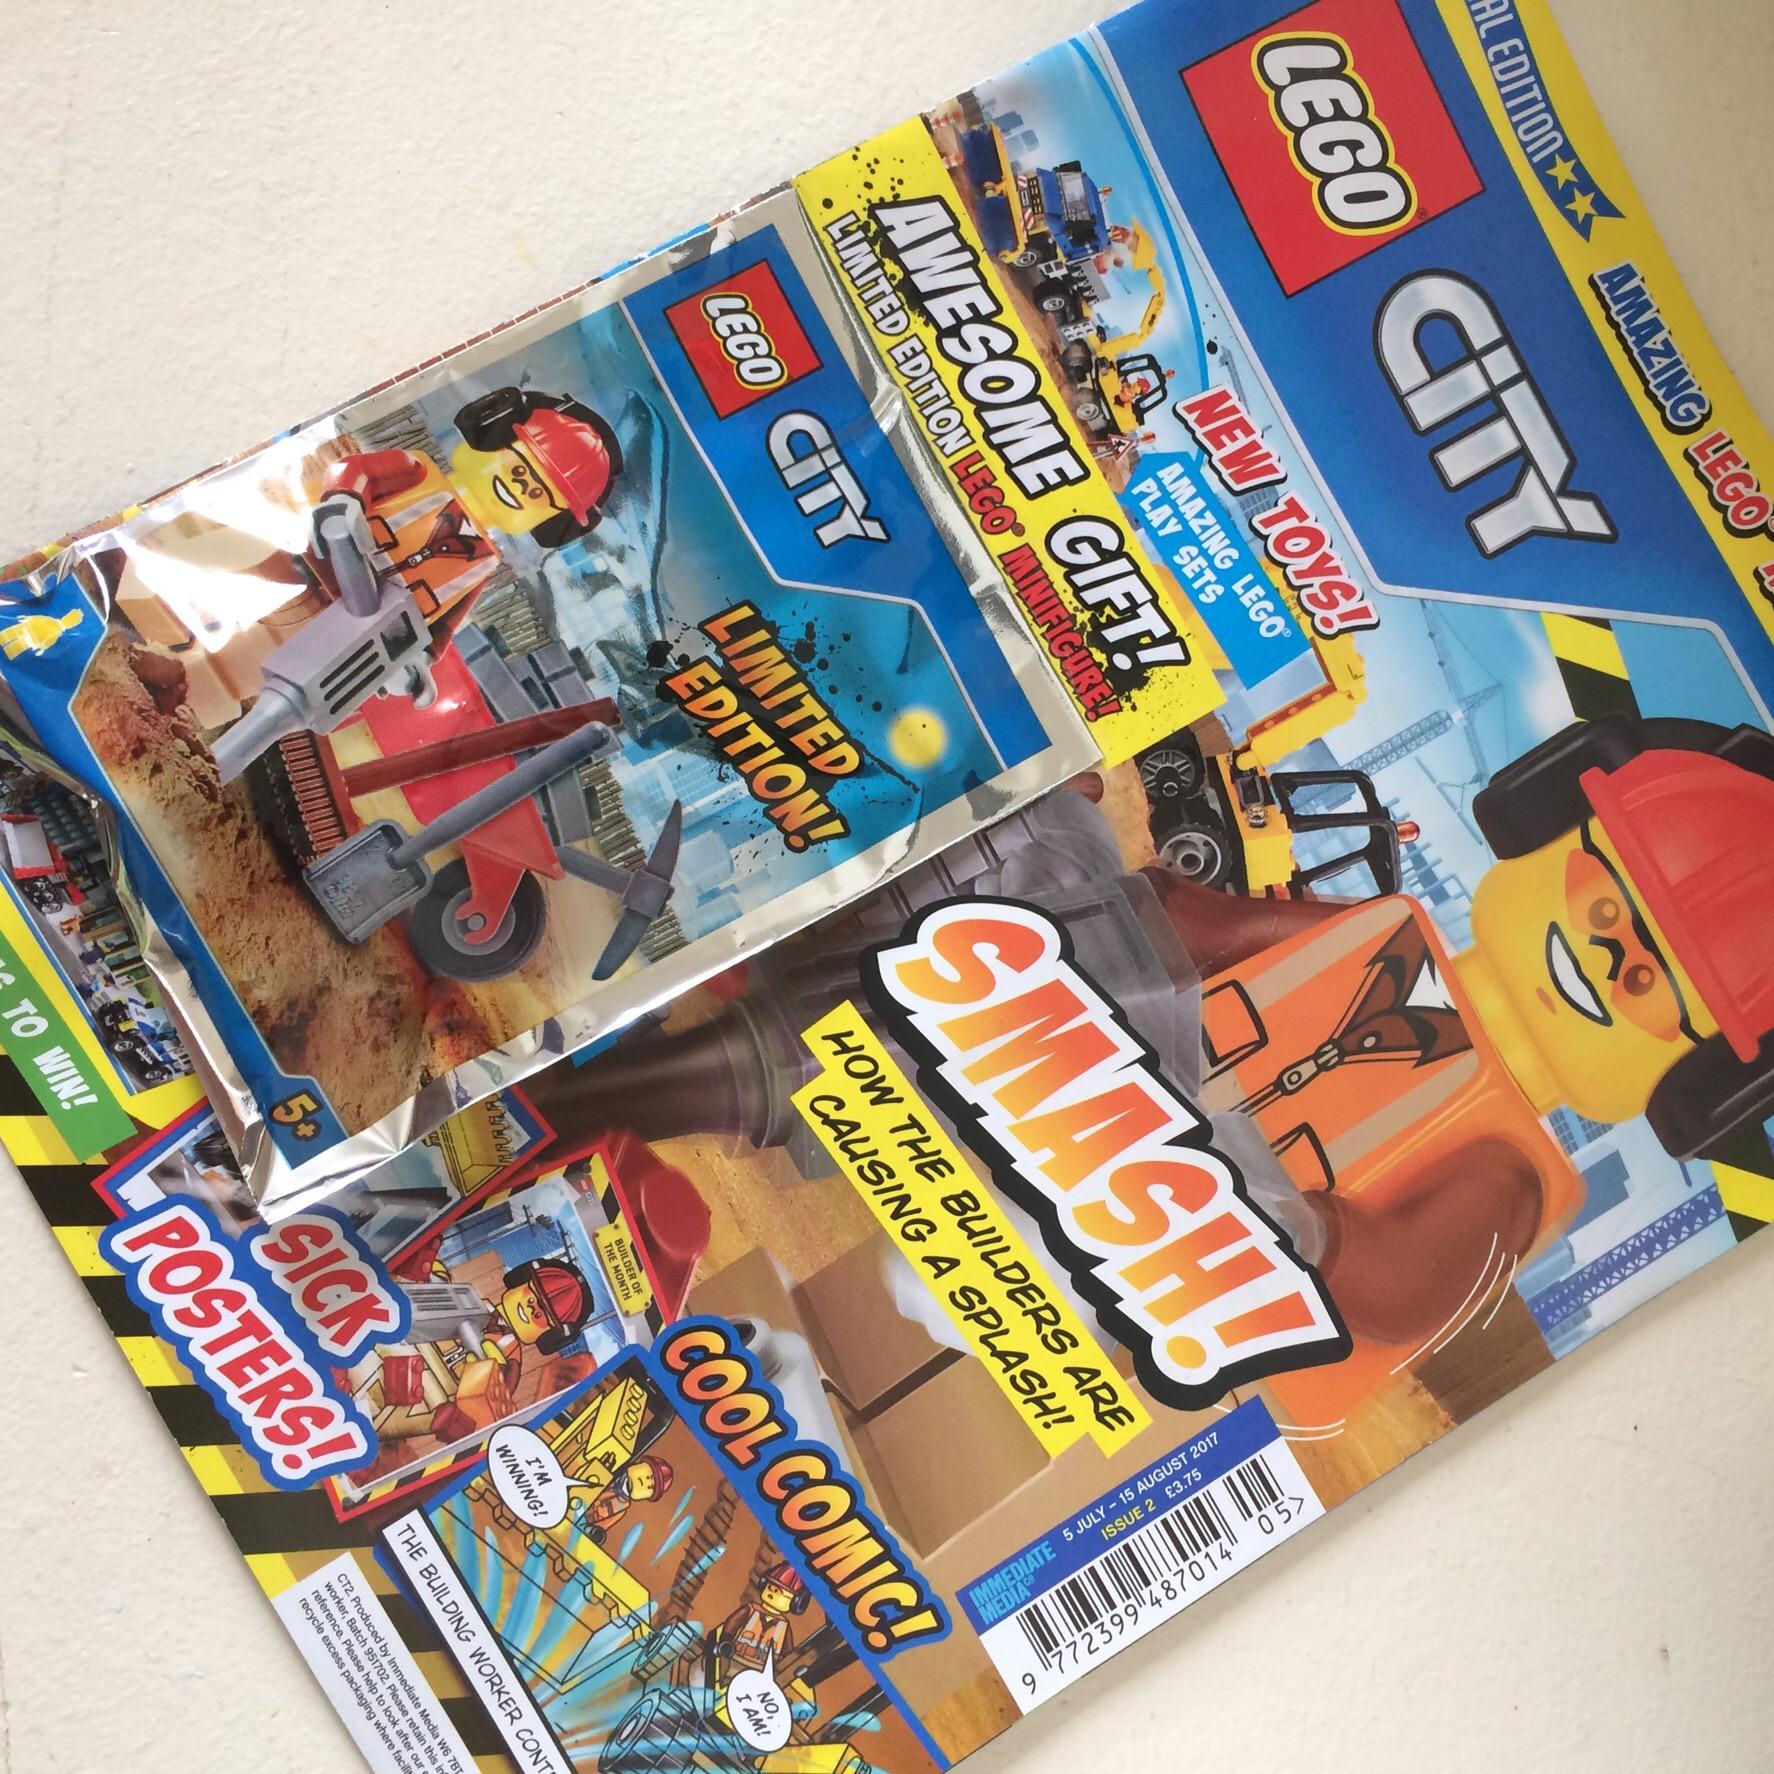 lego city magazine issue 2 lisa loves lego. Black Bedroom Furniture Sets. Home Design Ideas